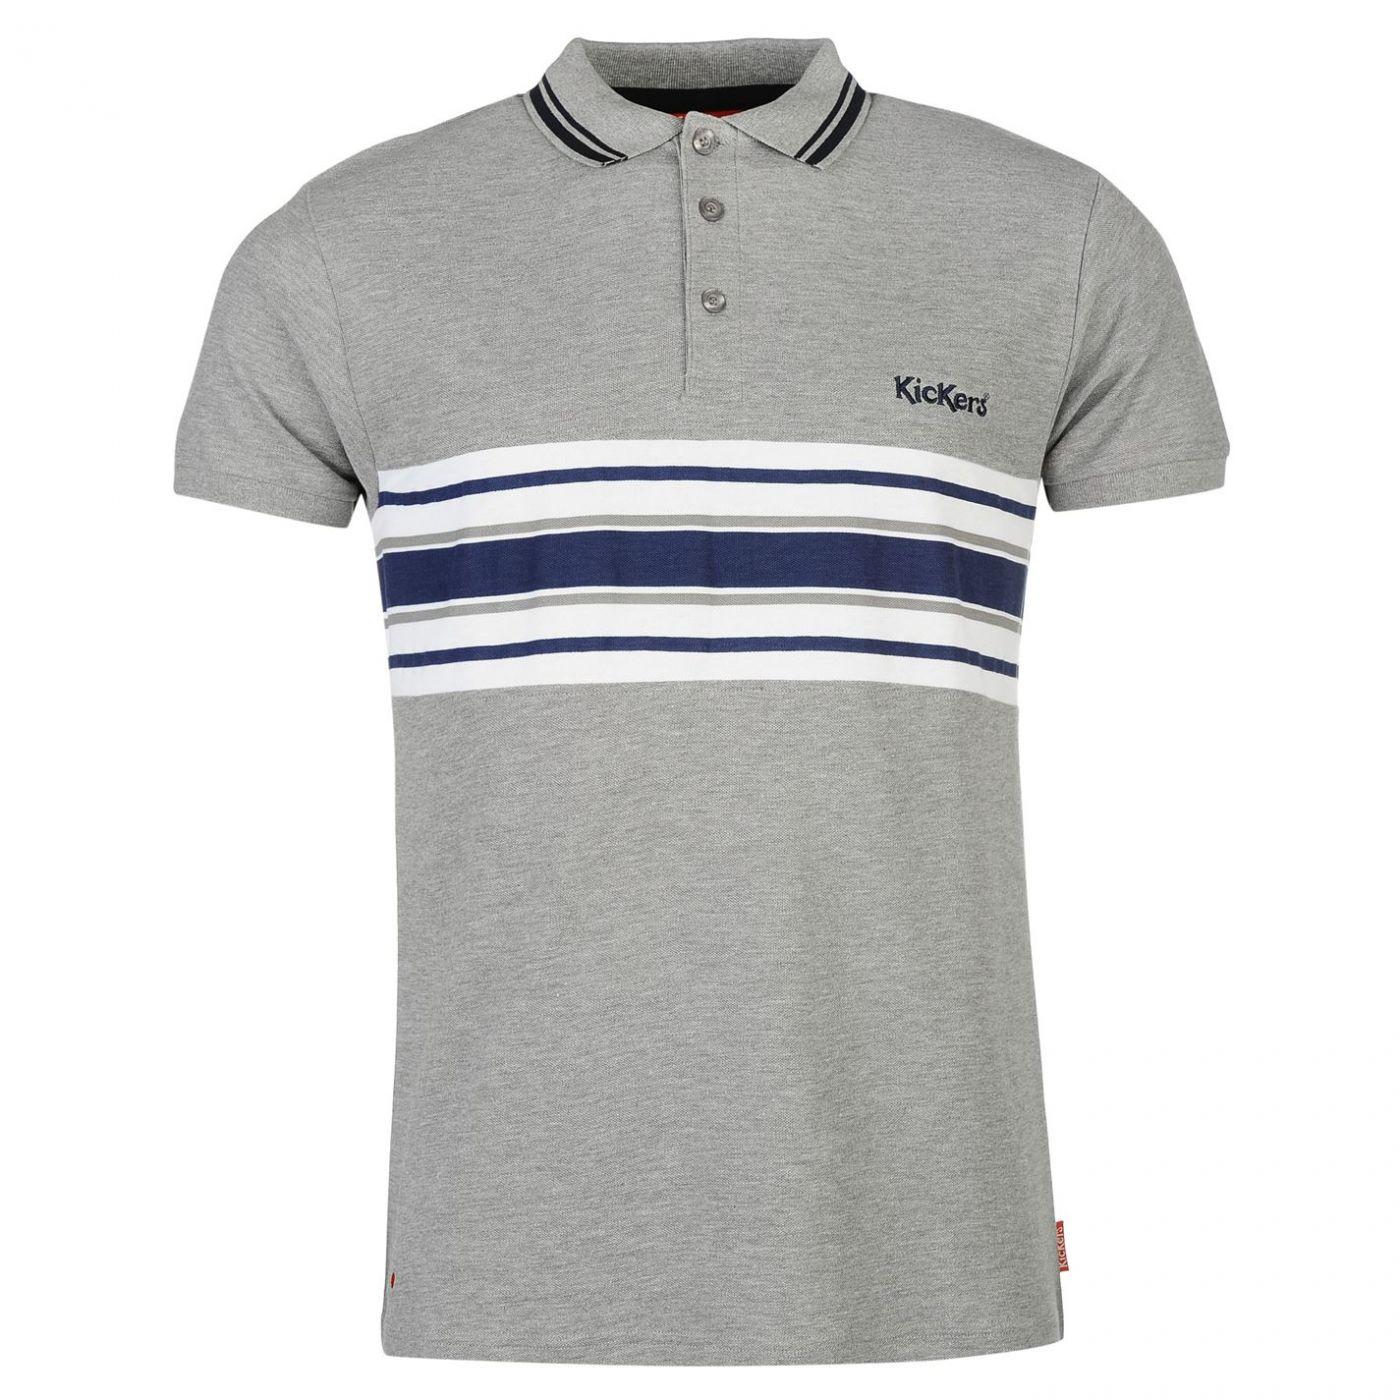 ed8b96e19180 Kickers Cut and Sew Stripe Polo Mens - FACTCOOL